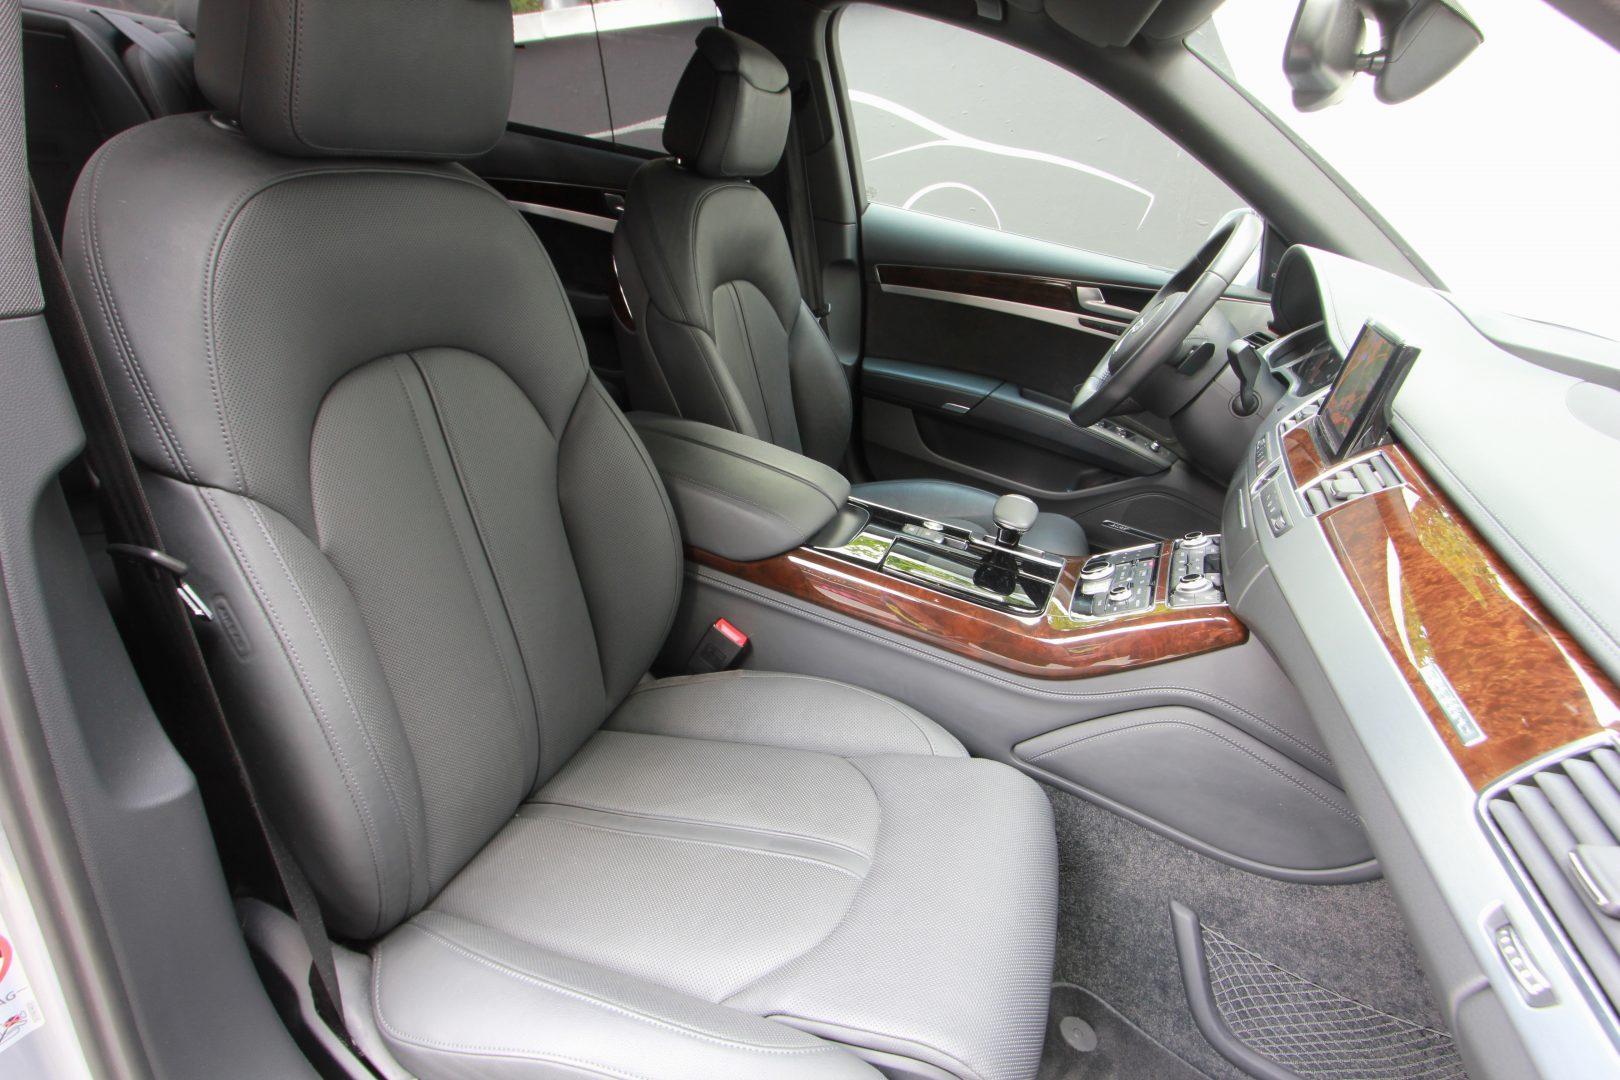 AIL Audi A8 3.0 TDI DAB Bose  4